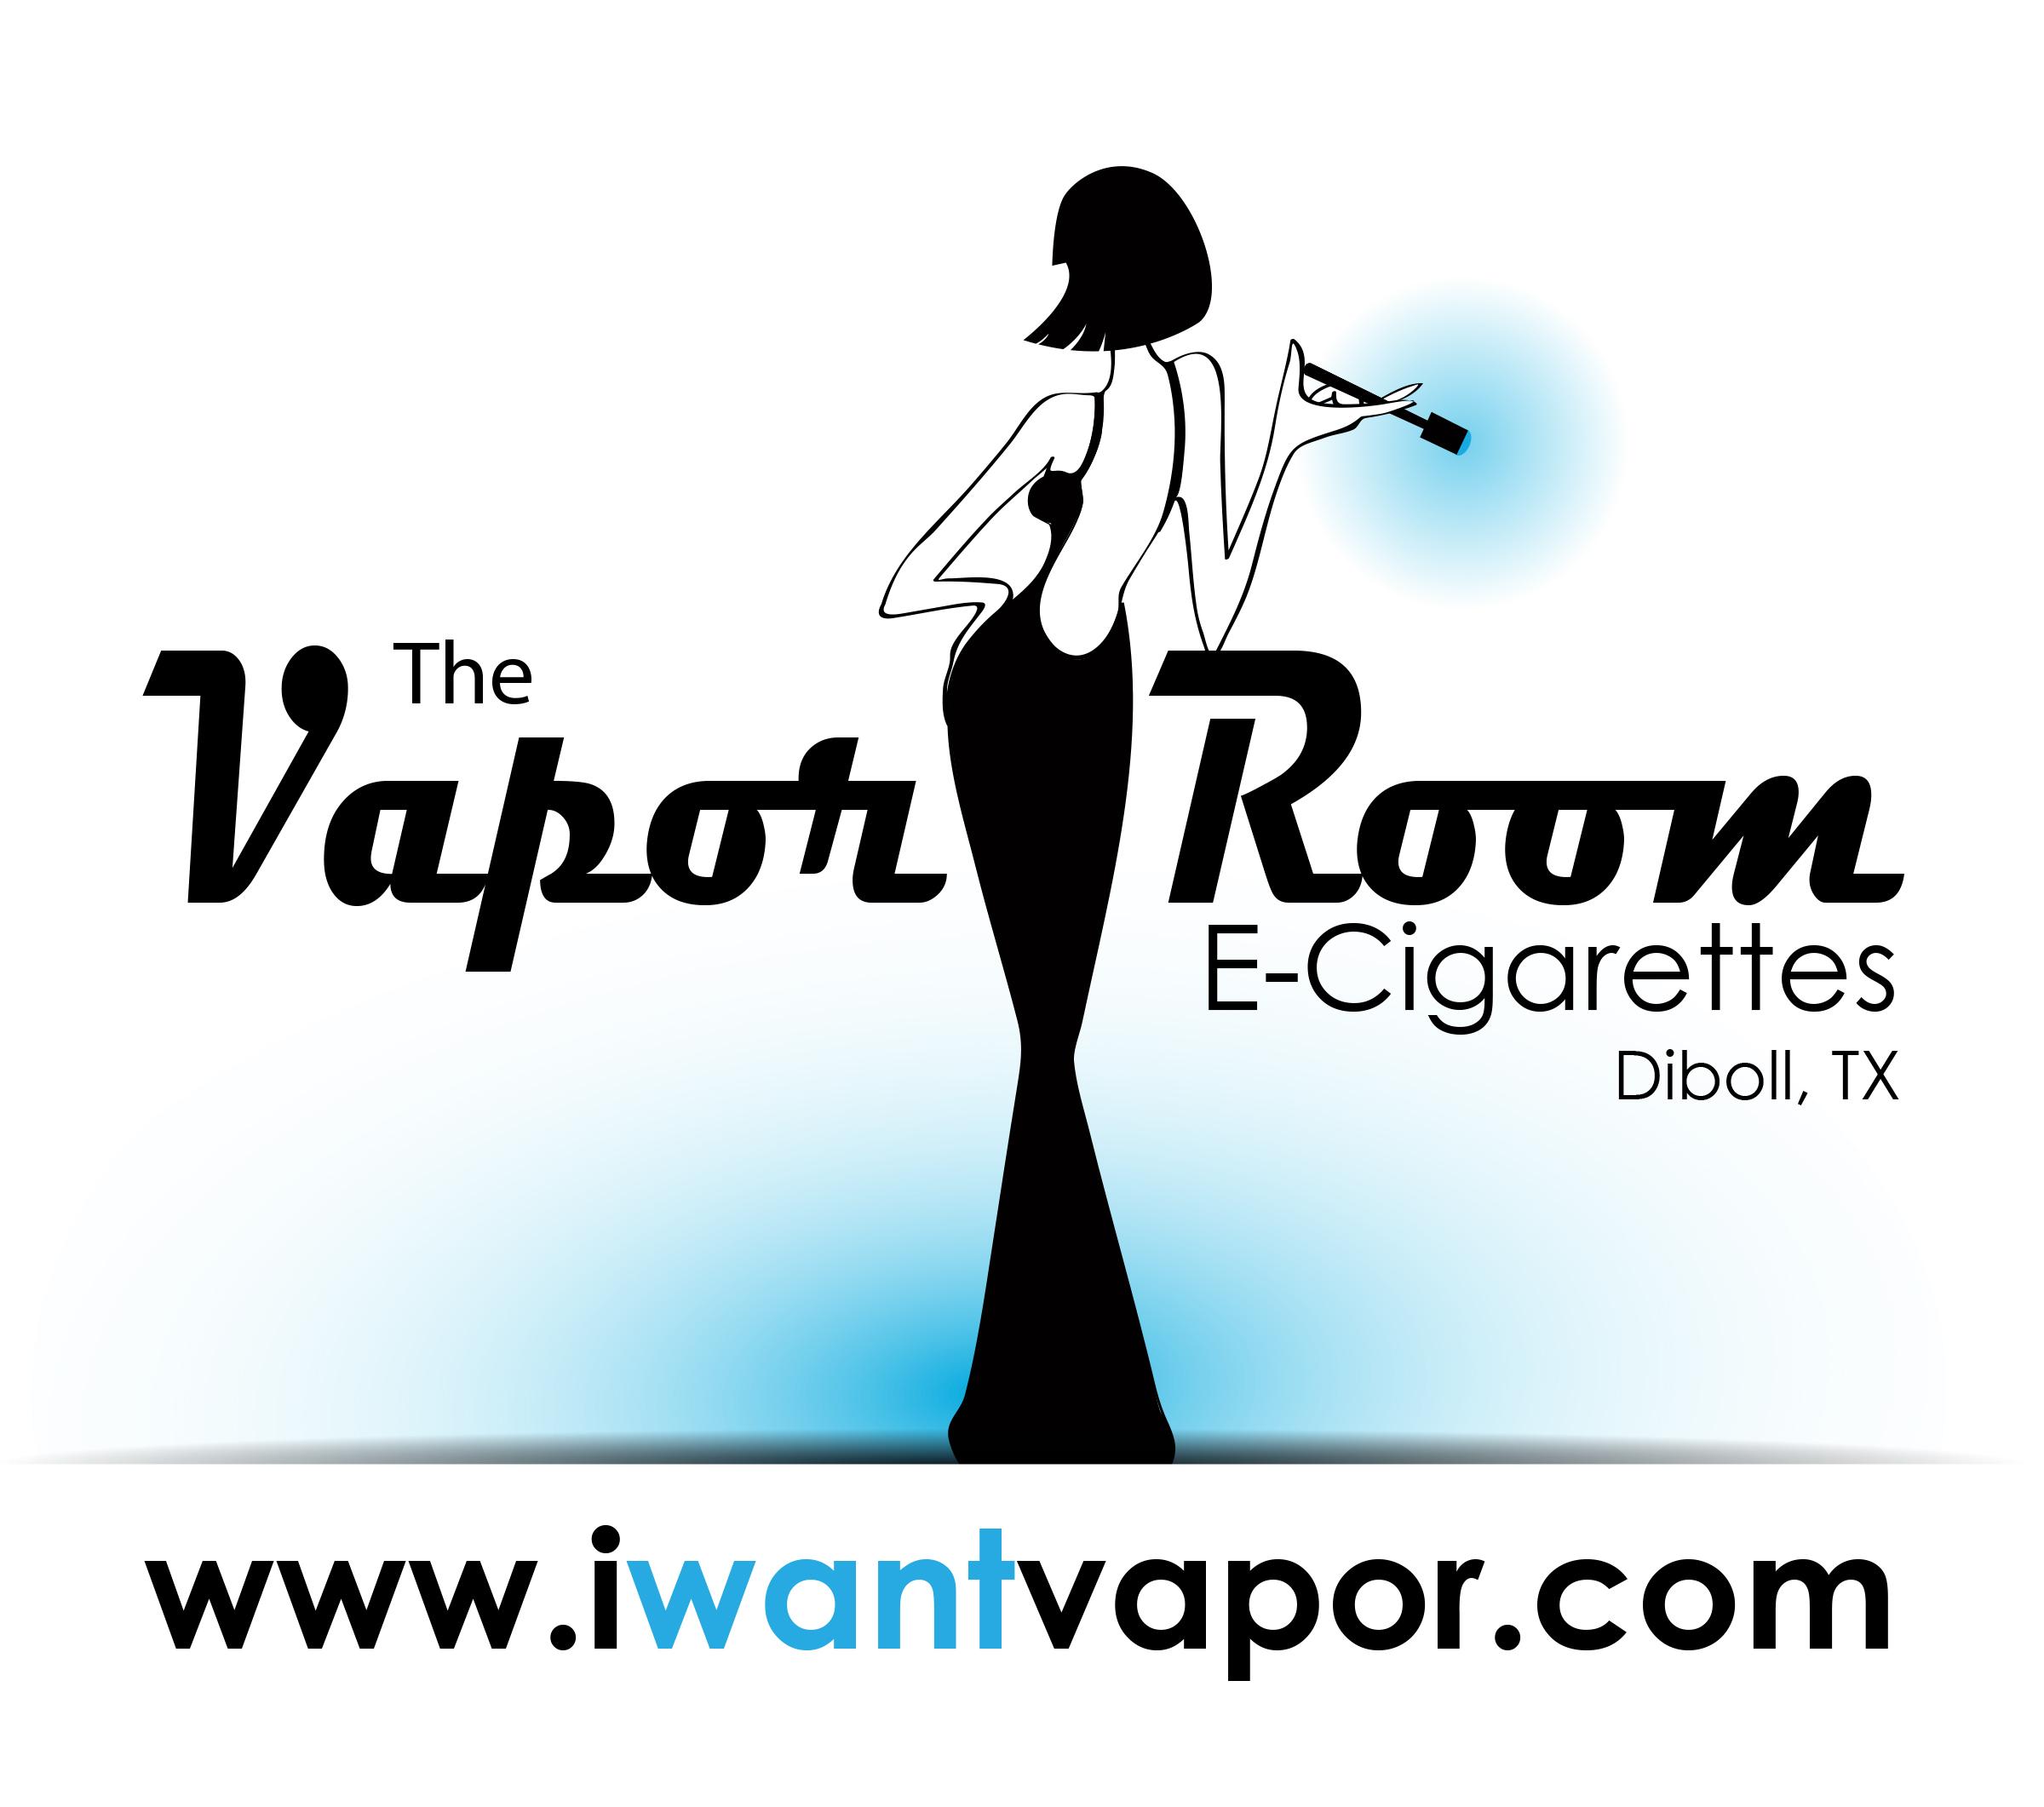 The Vapor Room